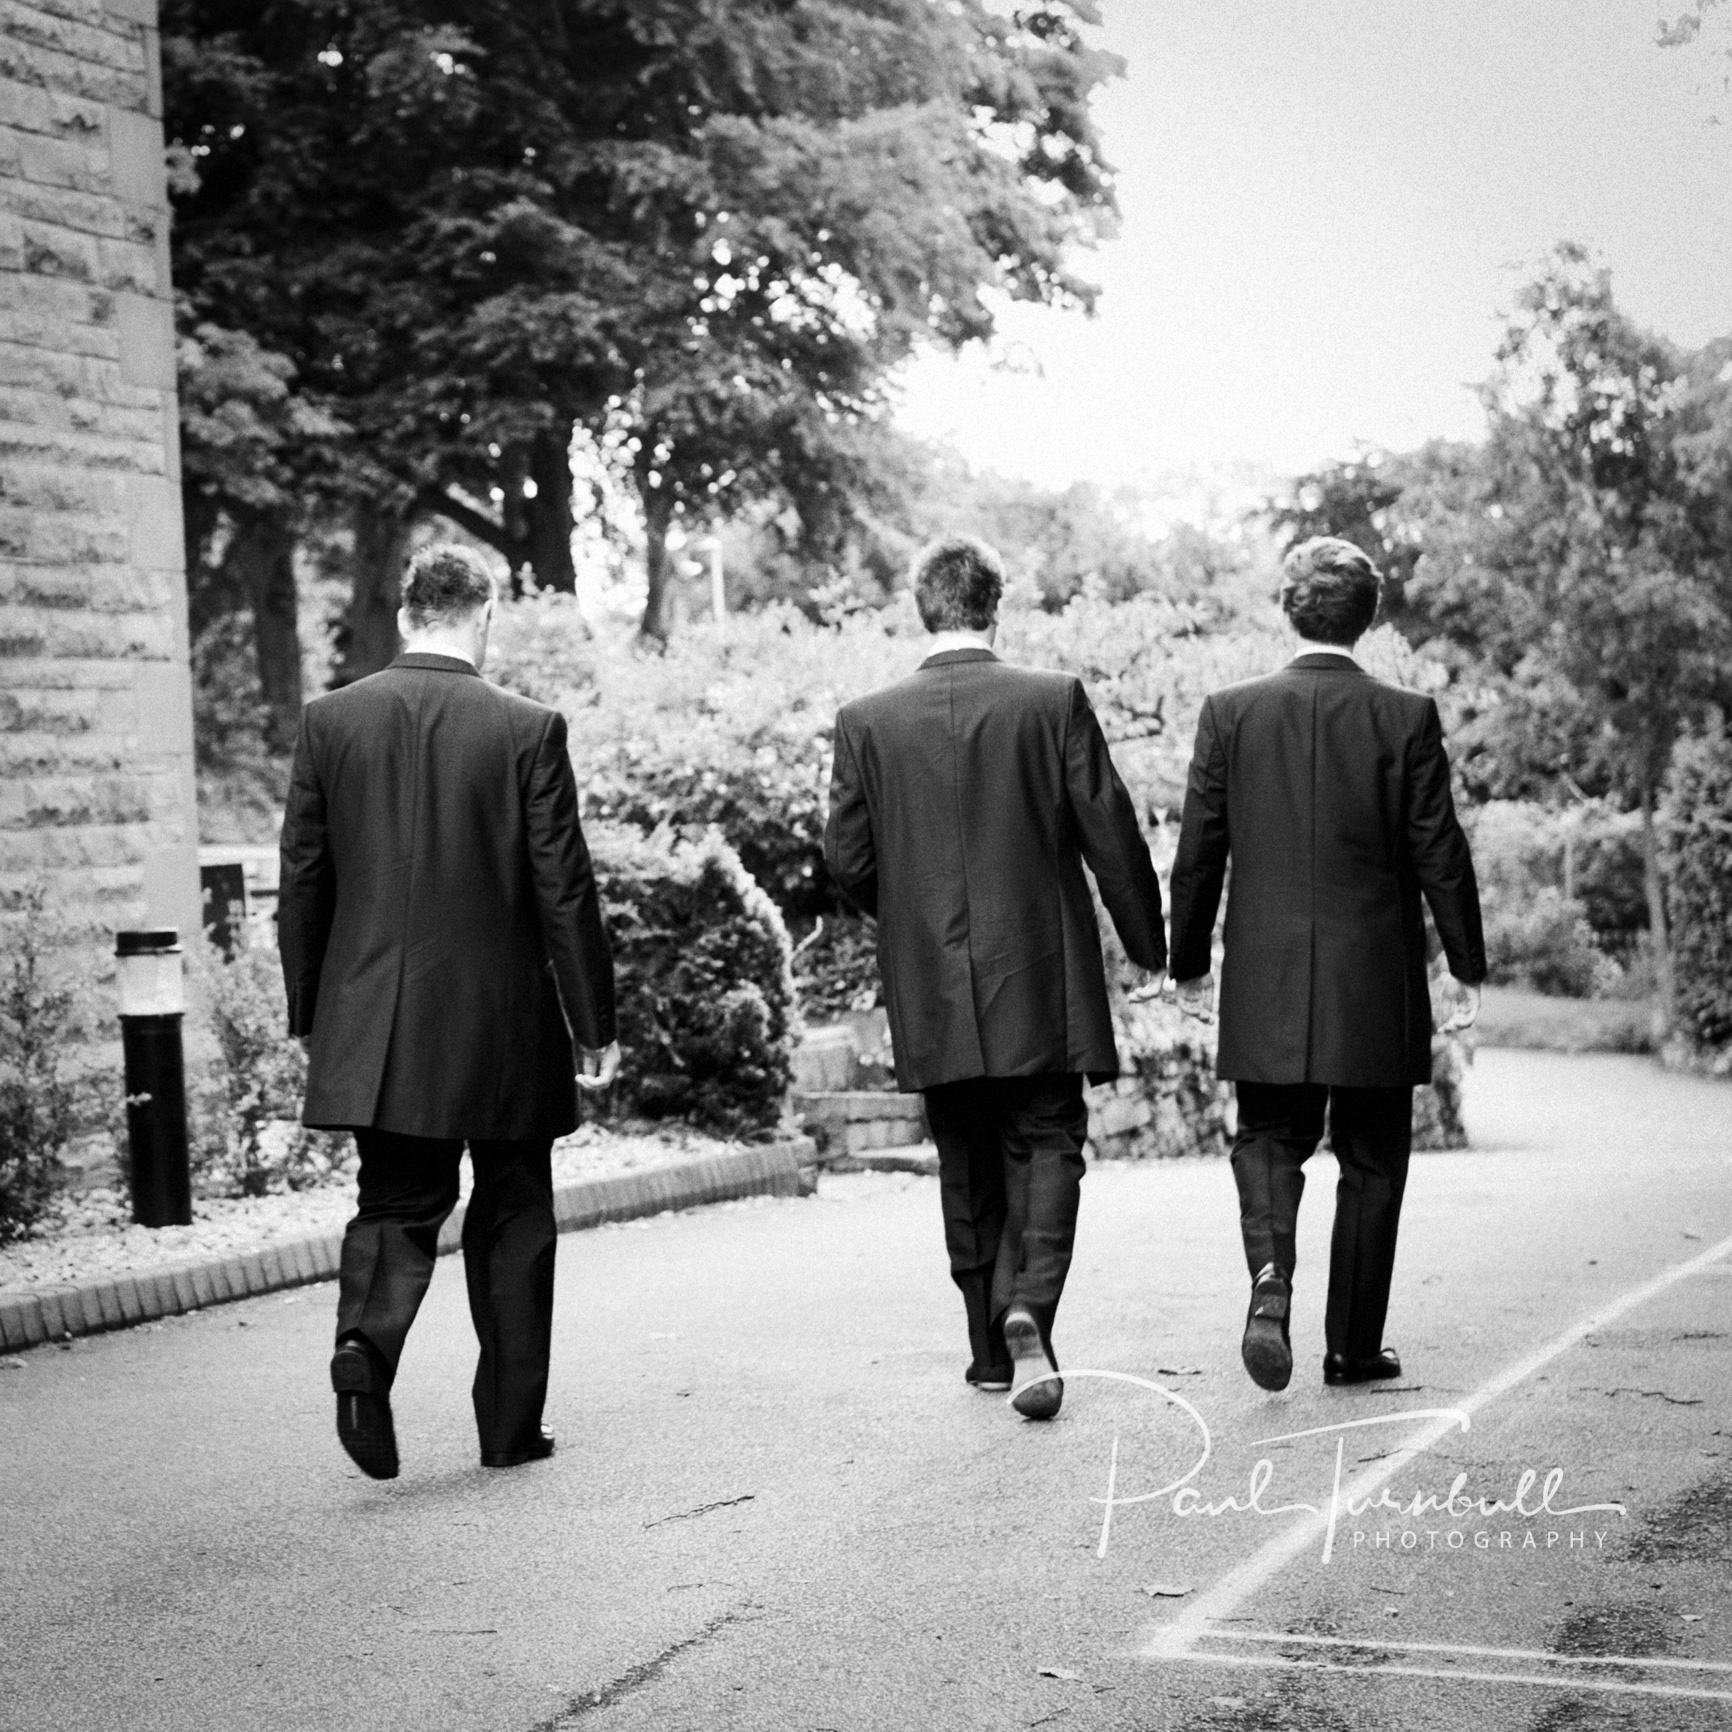 wedding-photography-healds-hall-liversedge-yorkshire-024.jpg